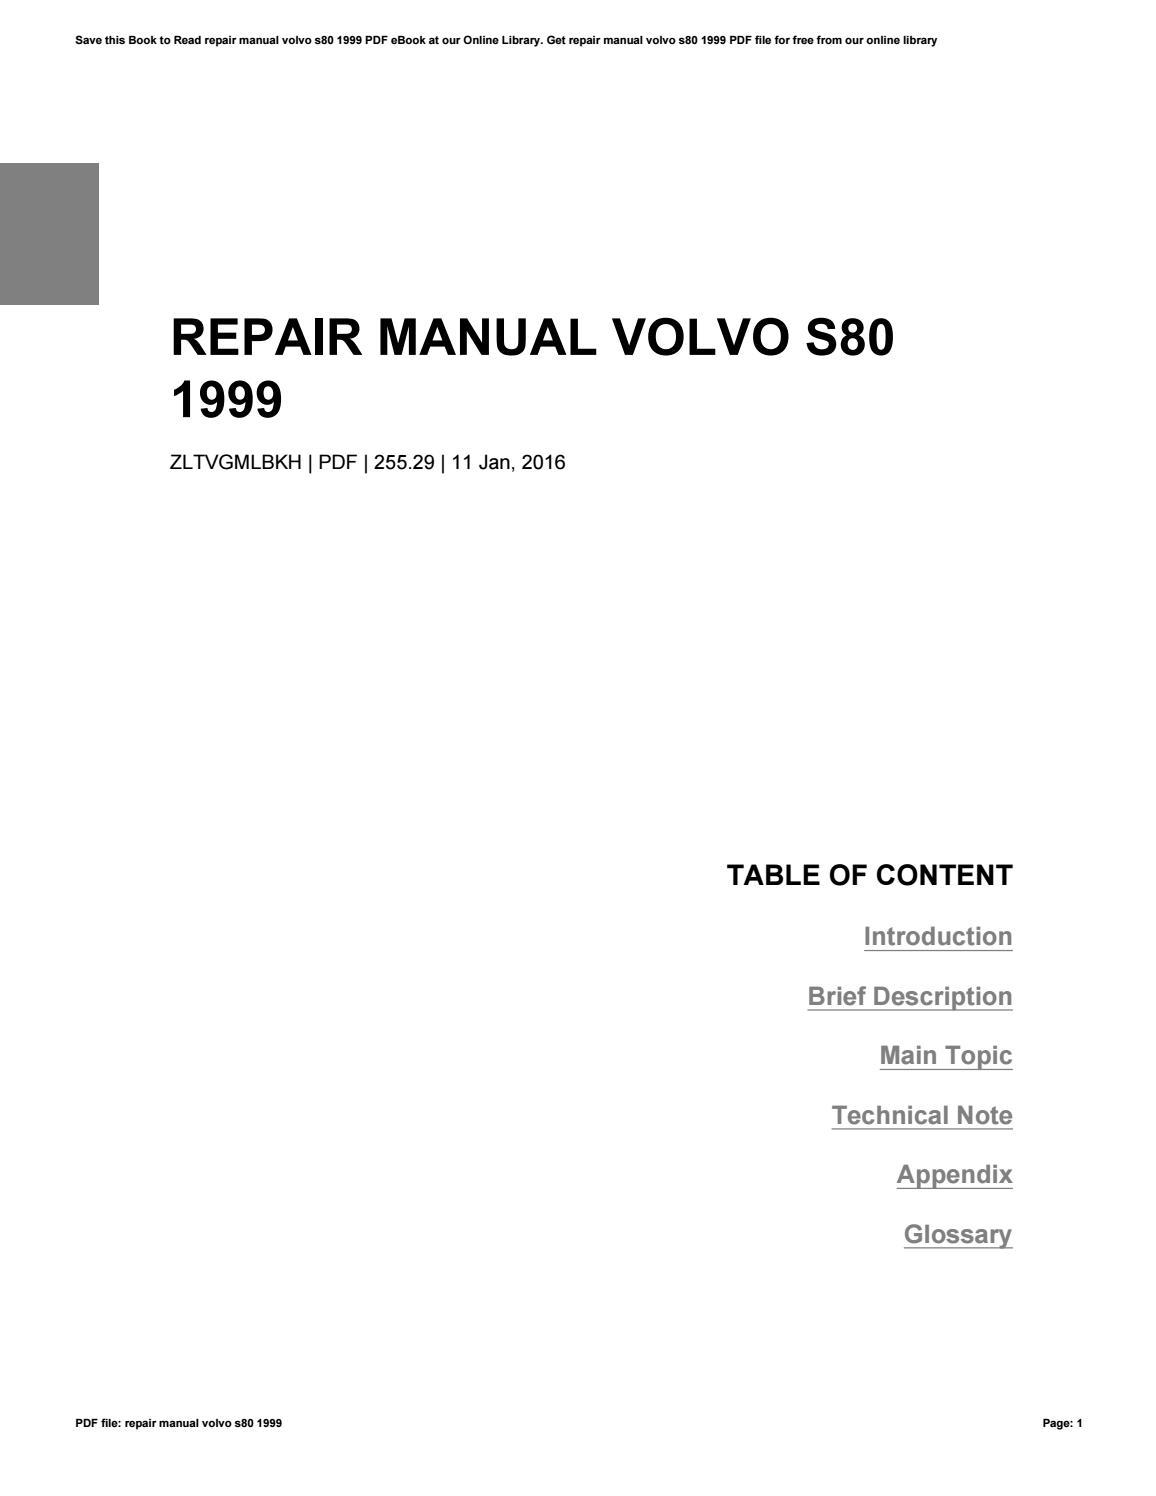 repair service juanvictorortizflores volvo manual thumbnail